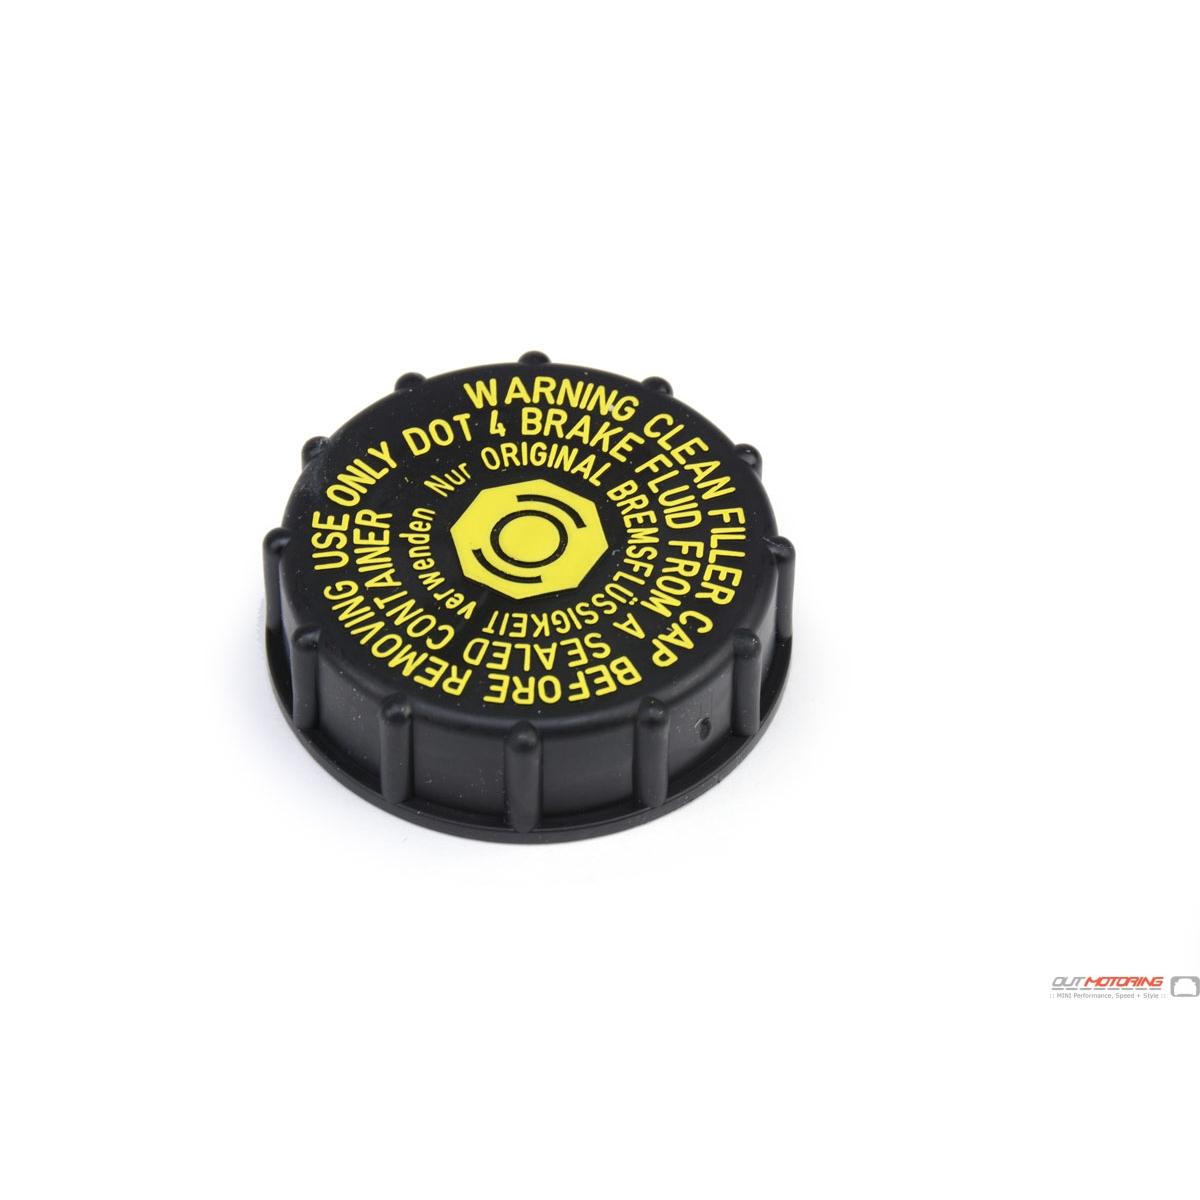 MINI Cooper Brake Fluid Expansion Tank Lid 34336756237